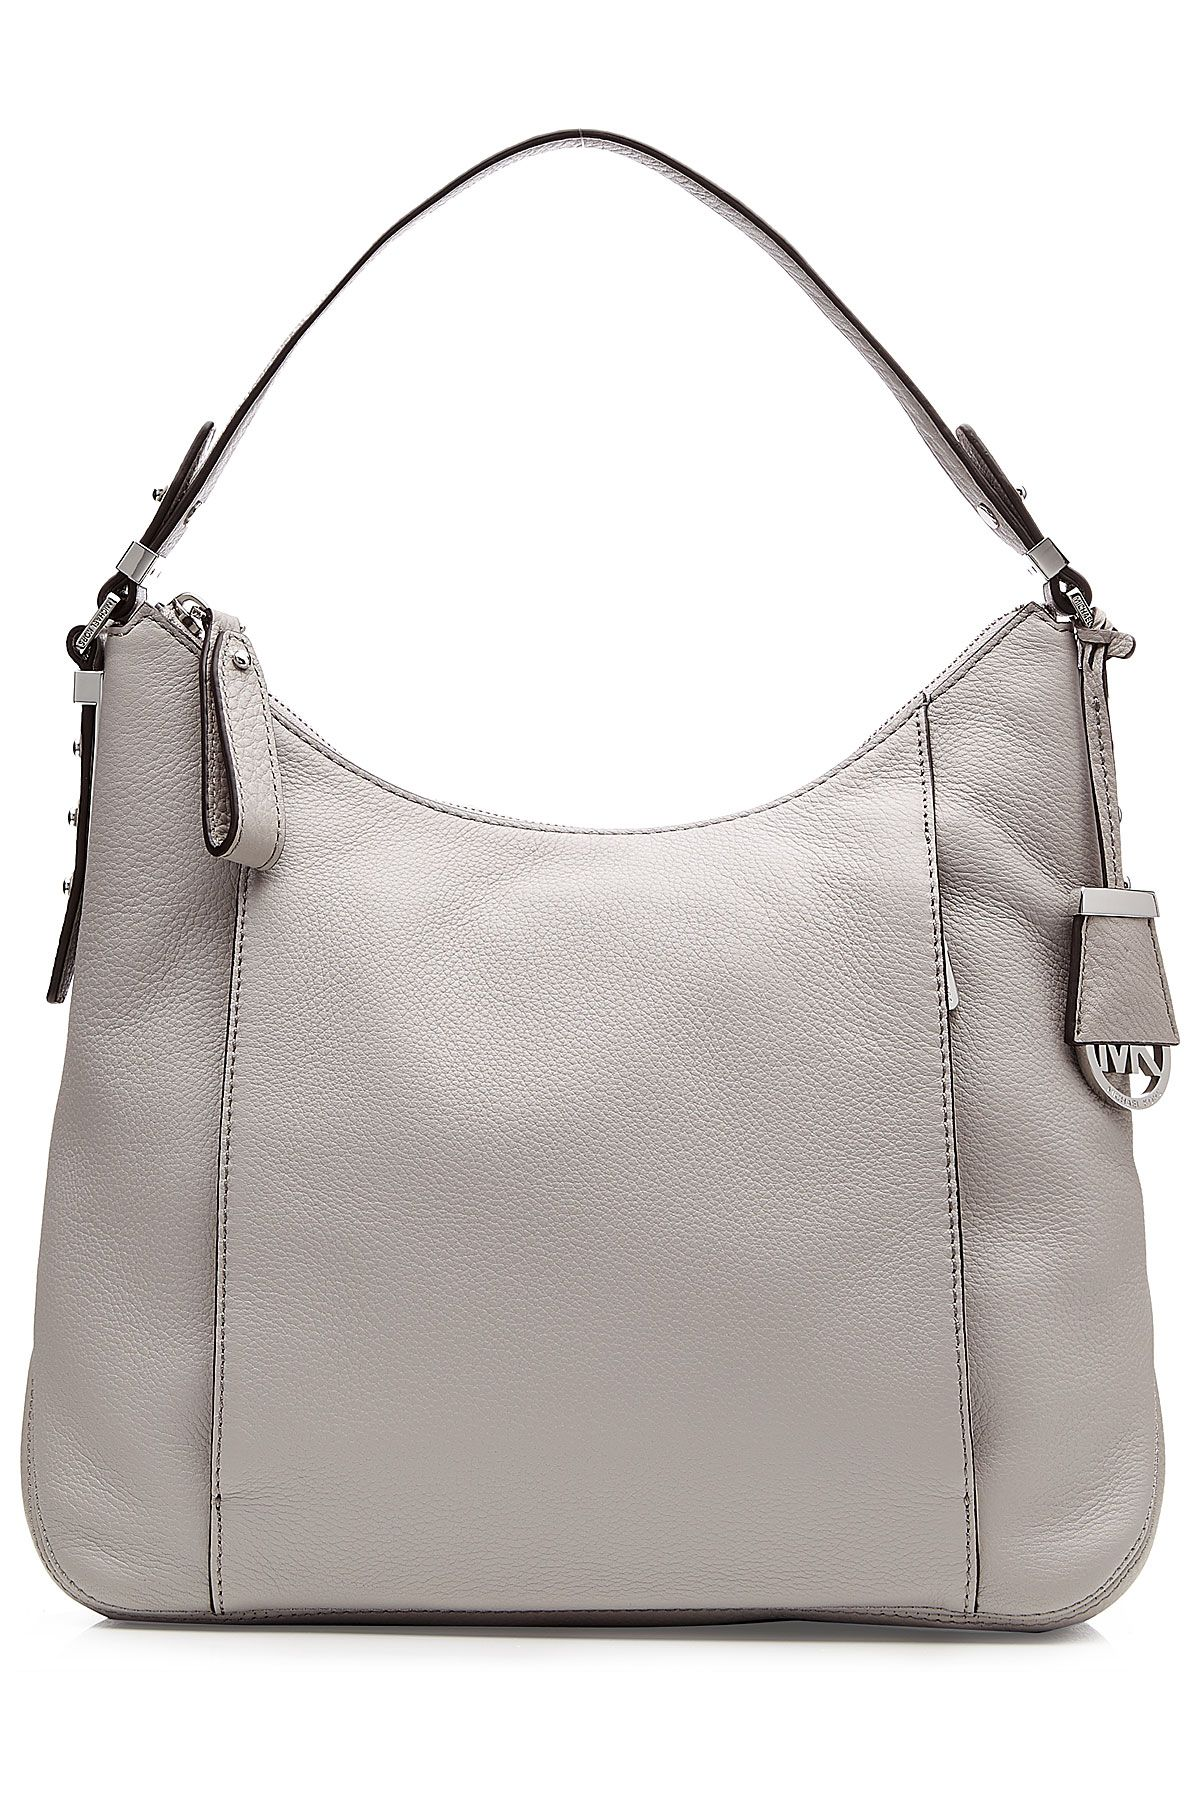 Gabrielle S Amazing Fantasy Closet Michael Kors Soft Gray Leather Hobo Bag